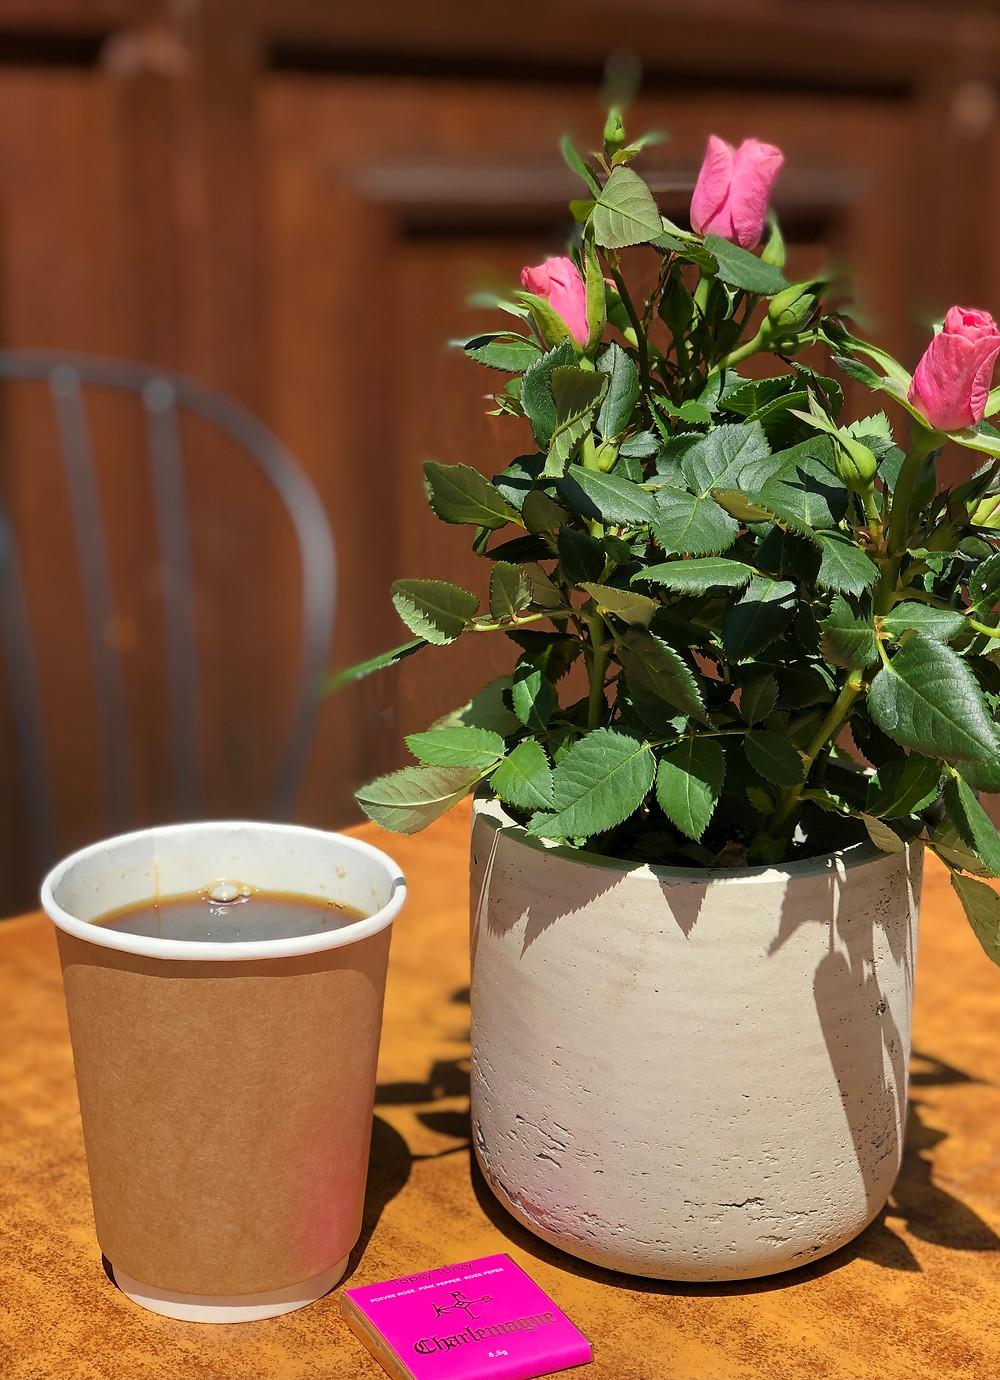 Coffee at Koffie Onan Leuven